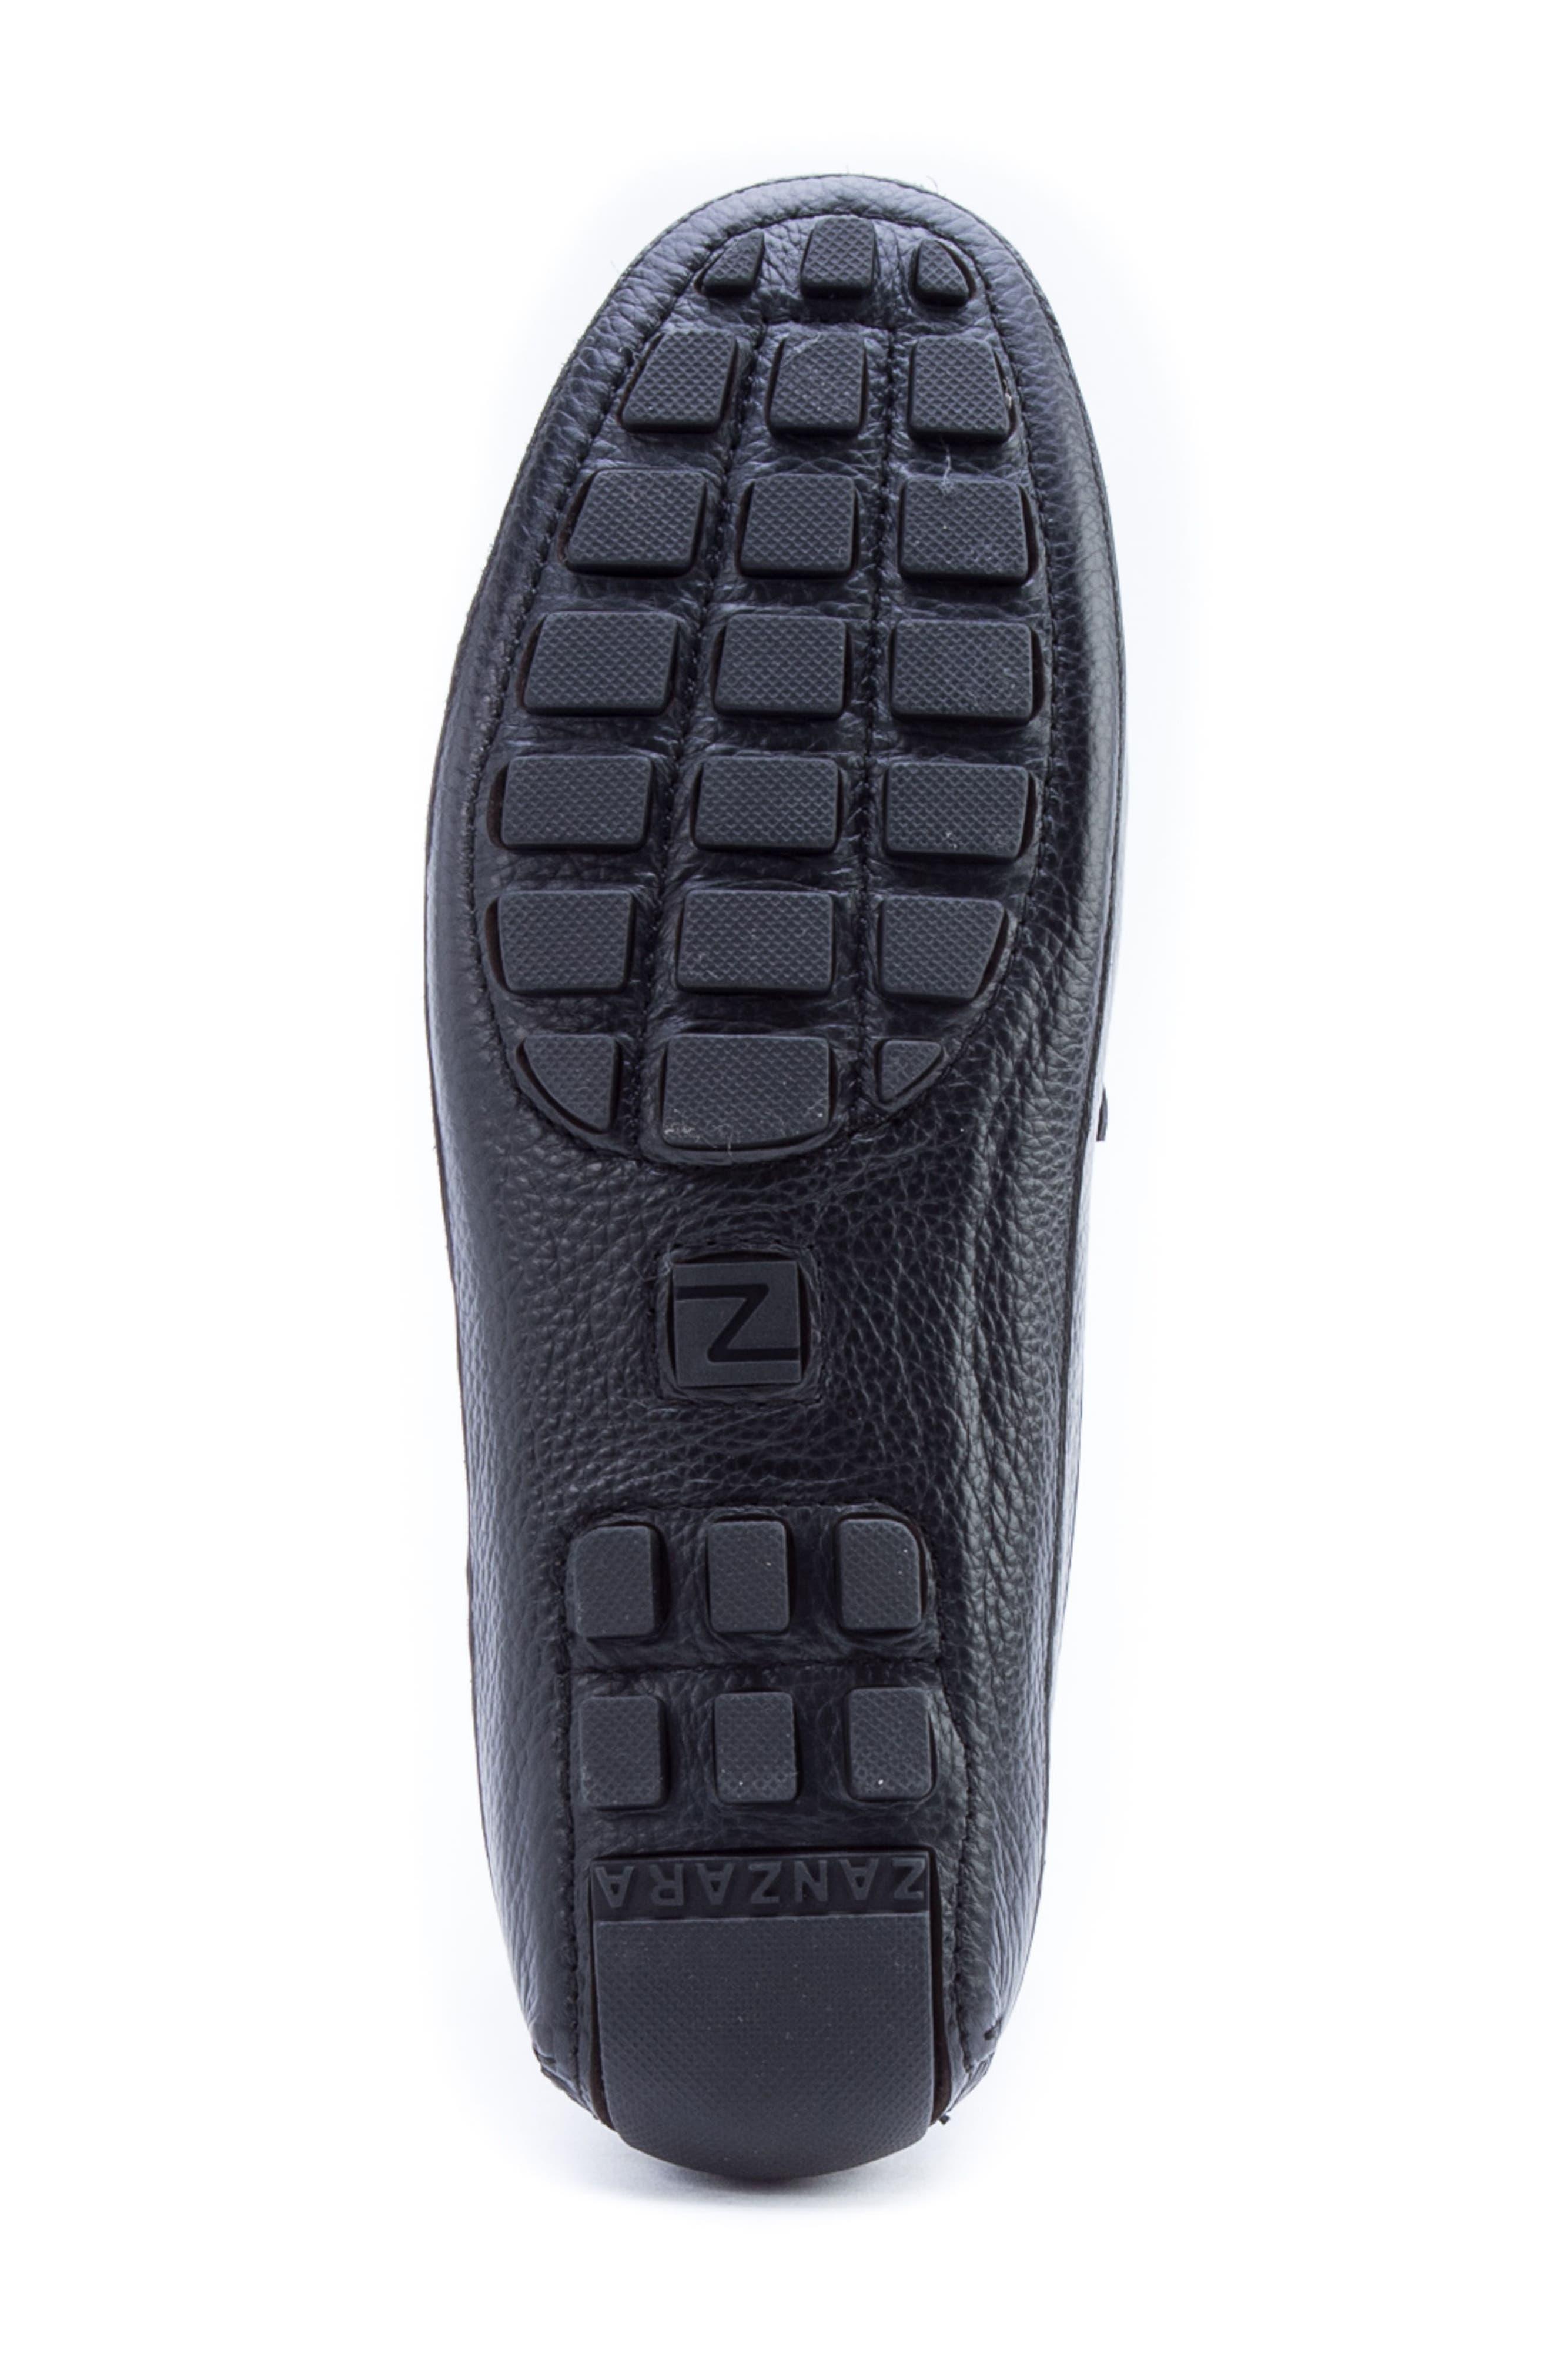 Kandinsky Moc Toe Driving Loafer,                             Alternate thumbnail 6, color,                             Black Leather